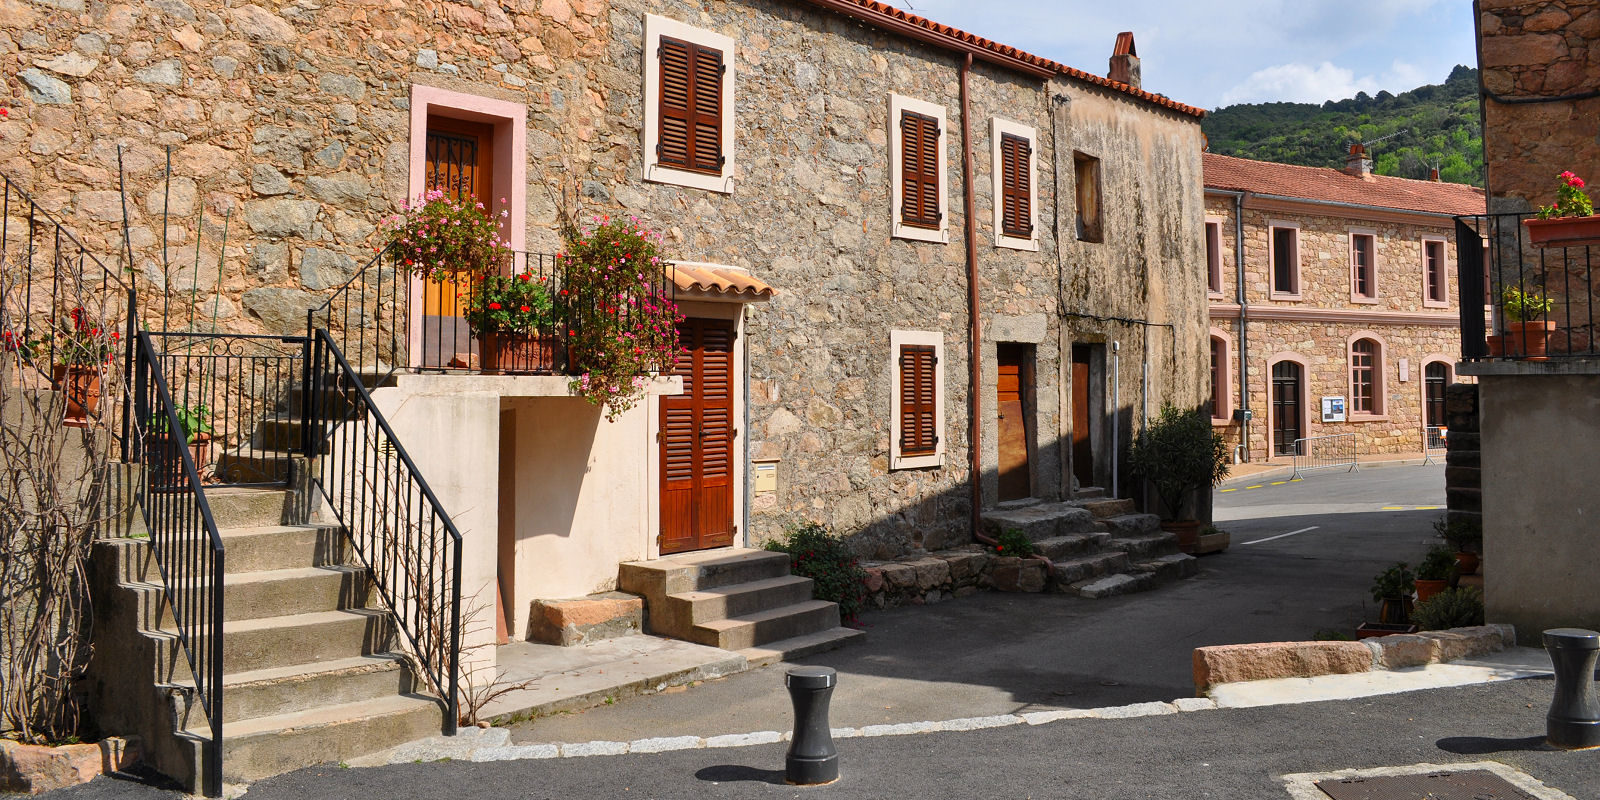 Hotel Capo Rosso Piana Calanques-de-Piana Corsica Frankrijk centrum stadje huizen luiken